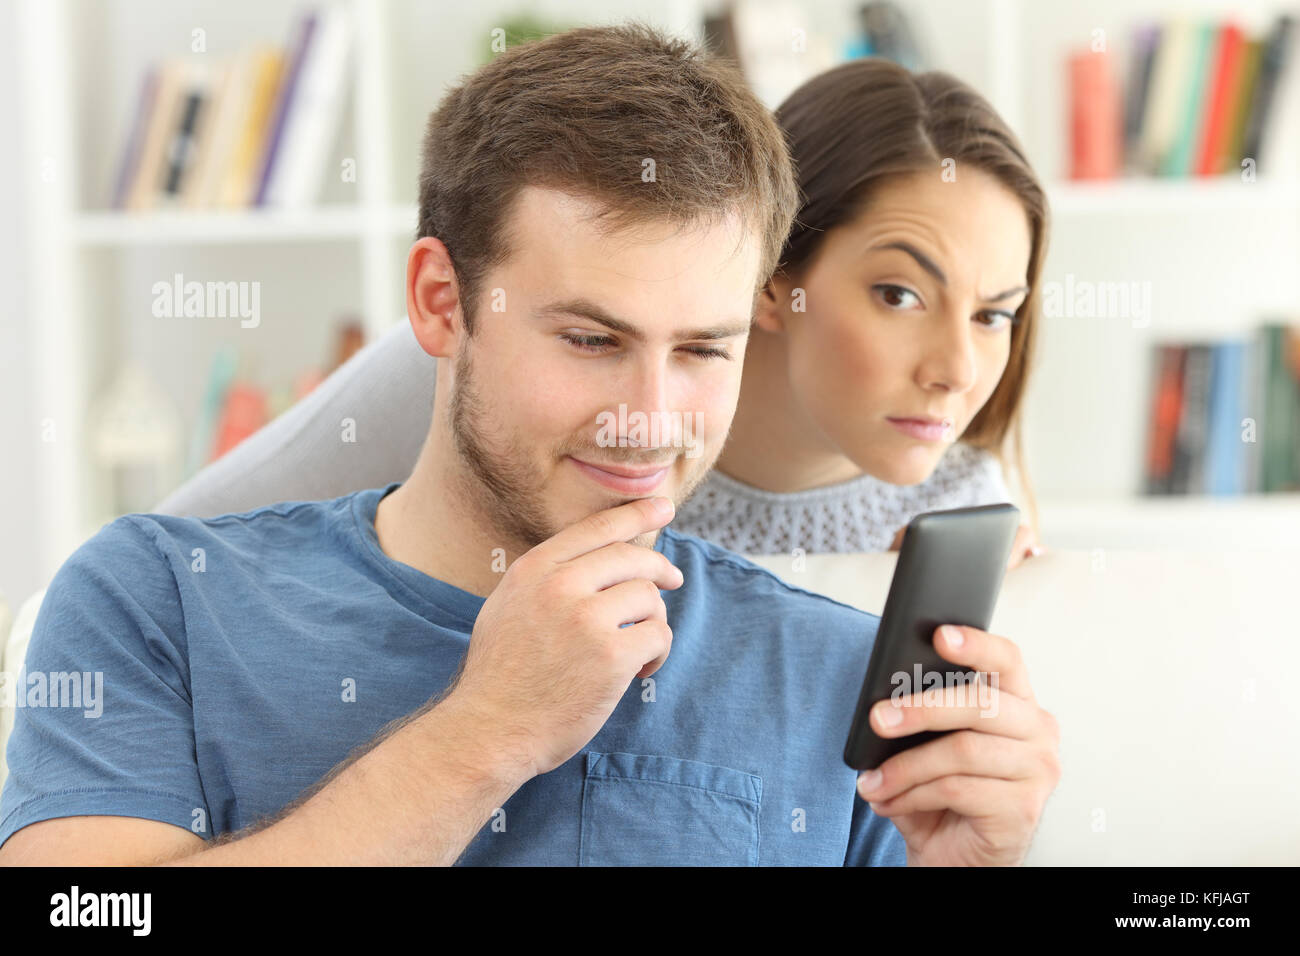 téléphone intelligent espionnage